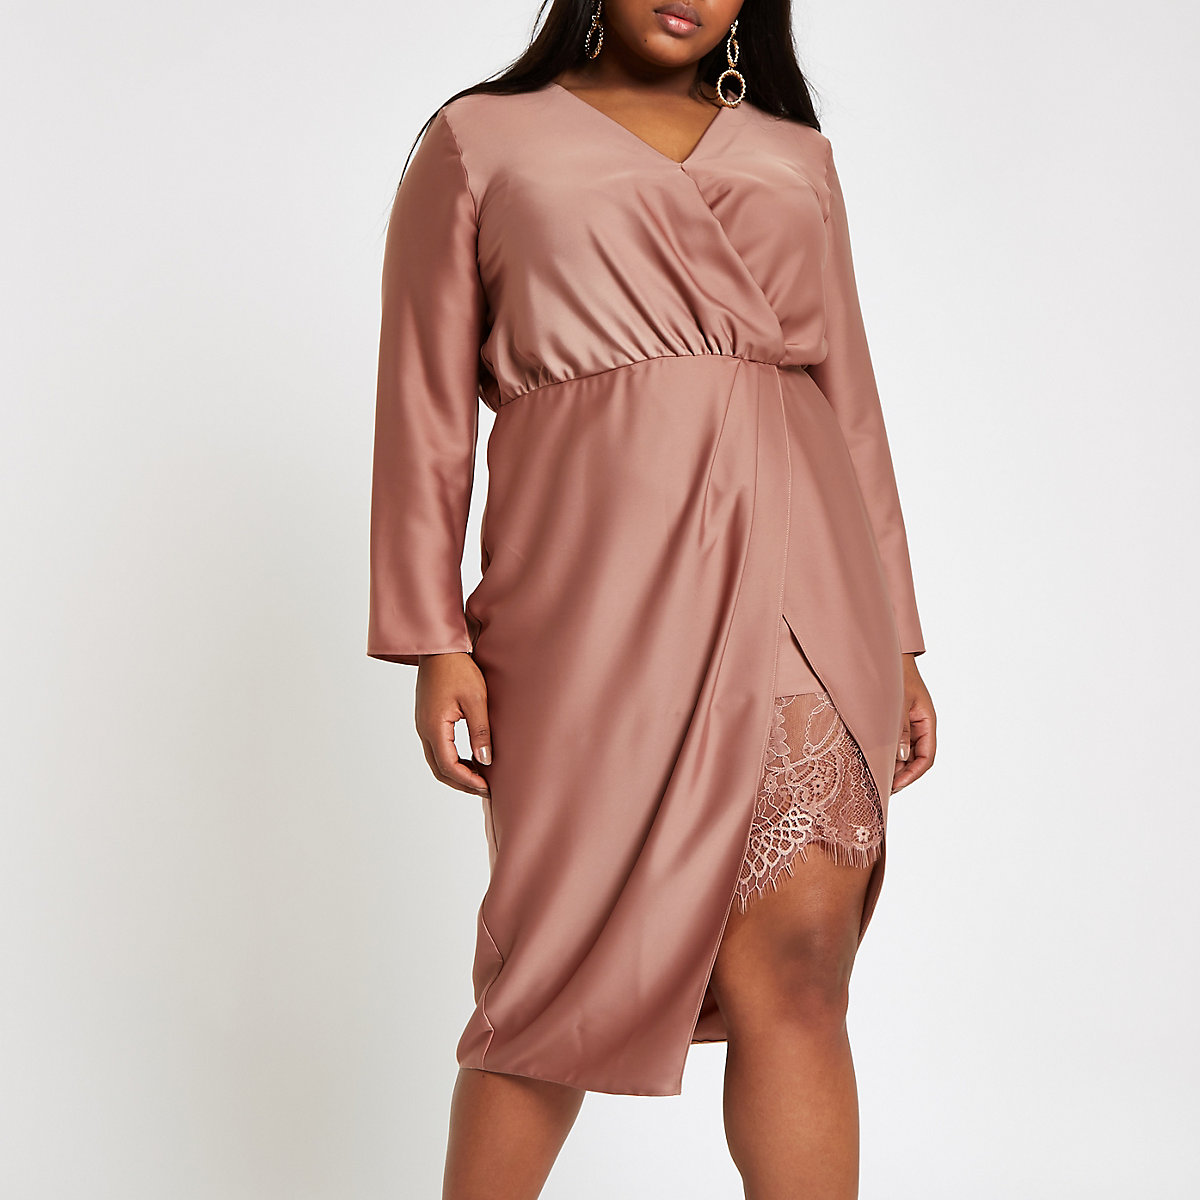 RI Plus - Roze getailleerde midi-jurk met overslag voor